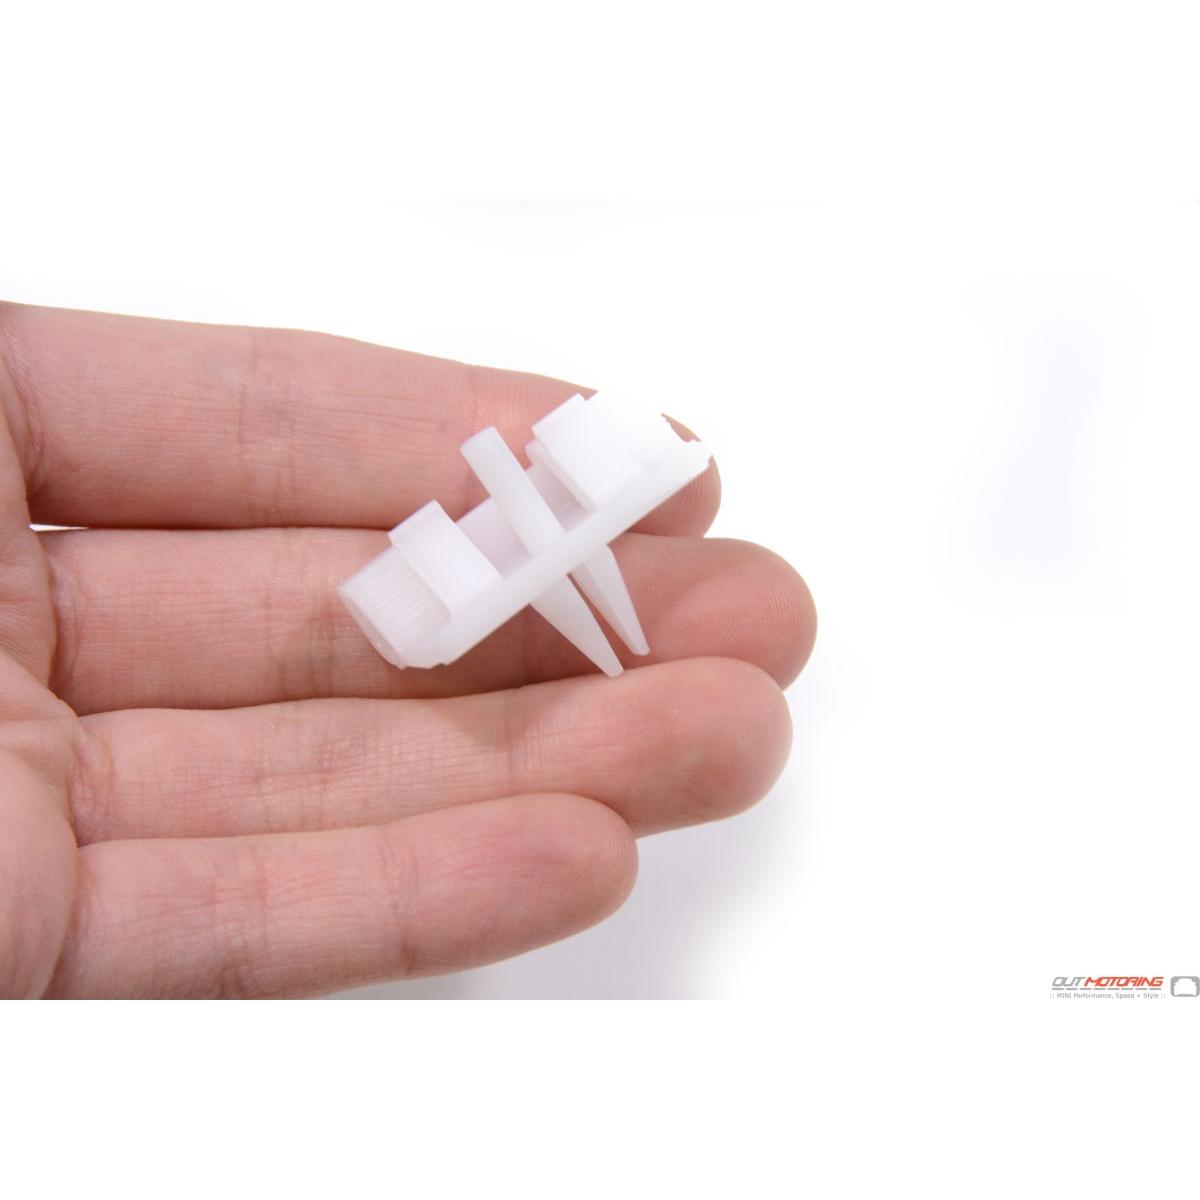 07131490537 MINI Cooper Replacement Windshield Trim Clip